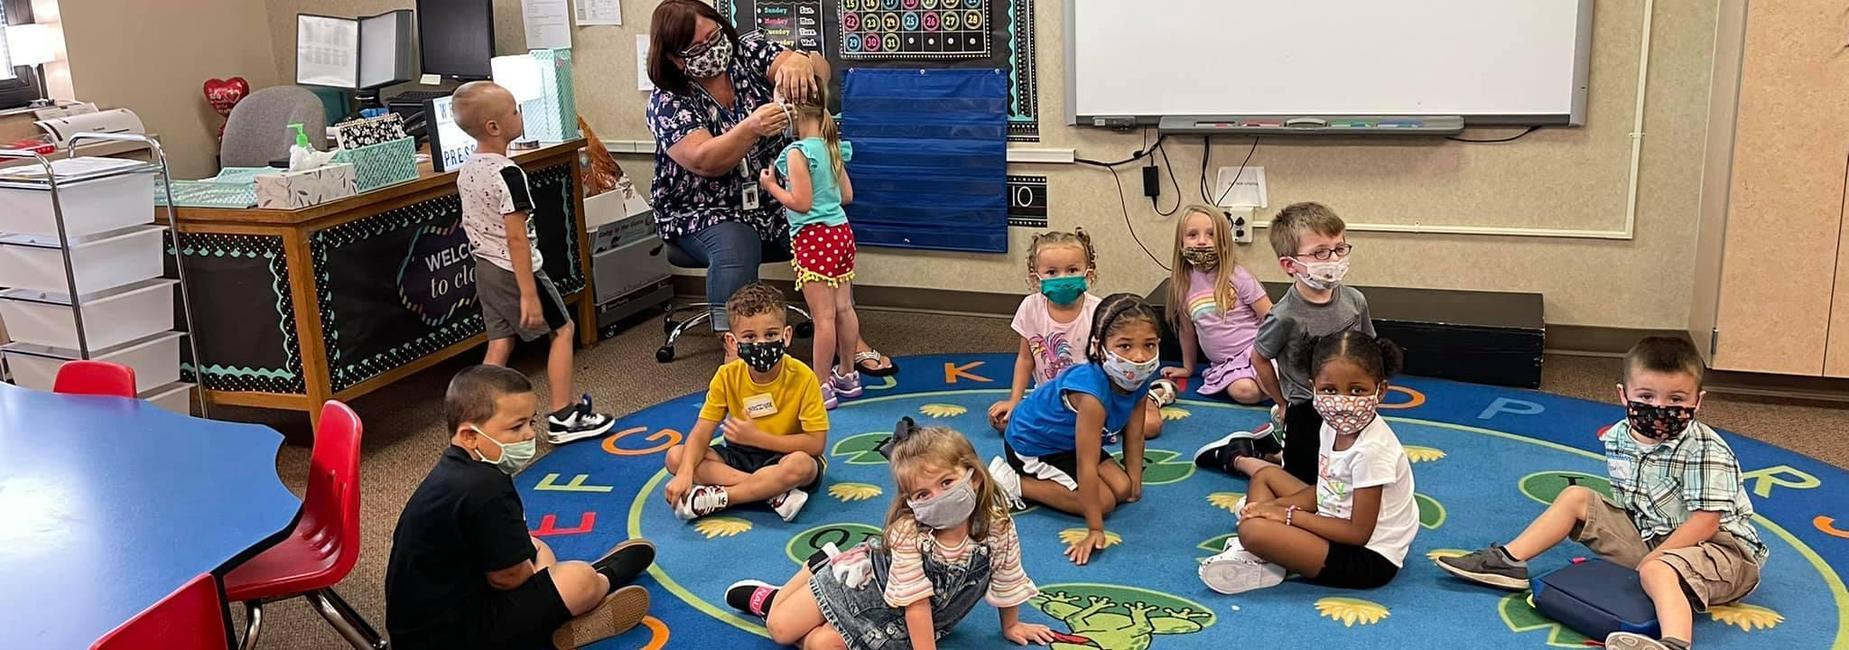 Preschool students at Crestdale Elementary